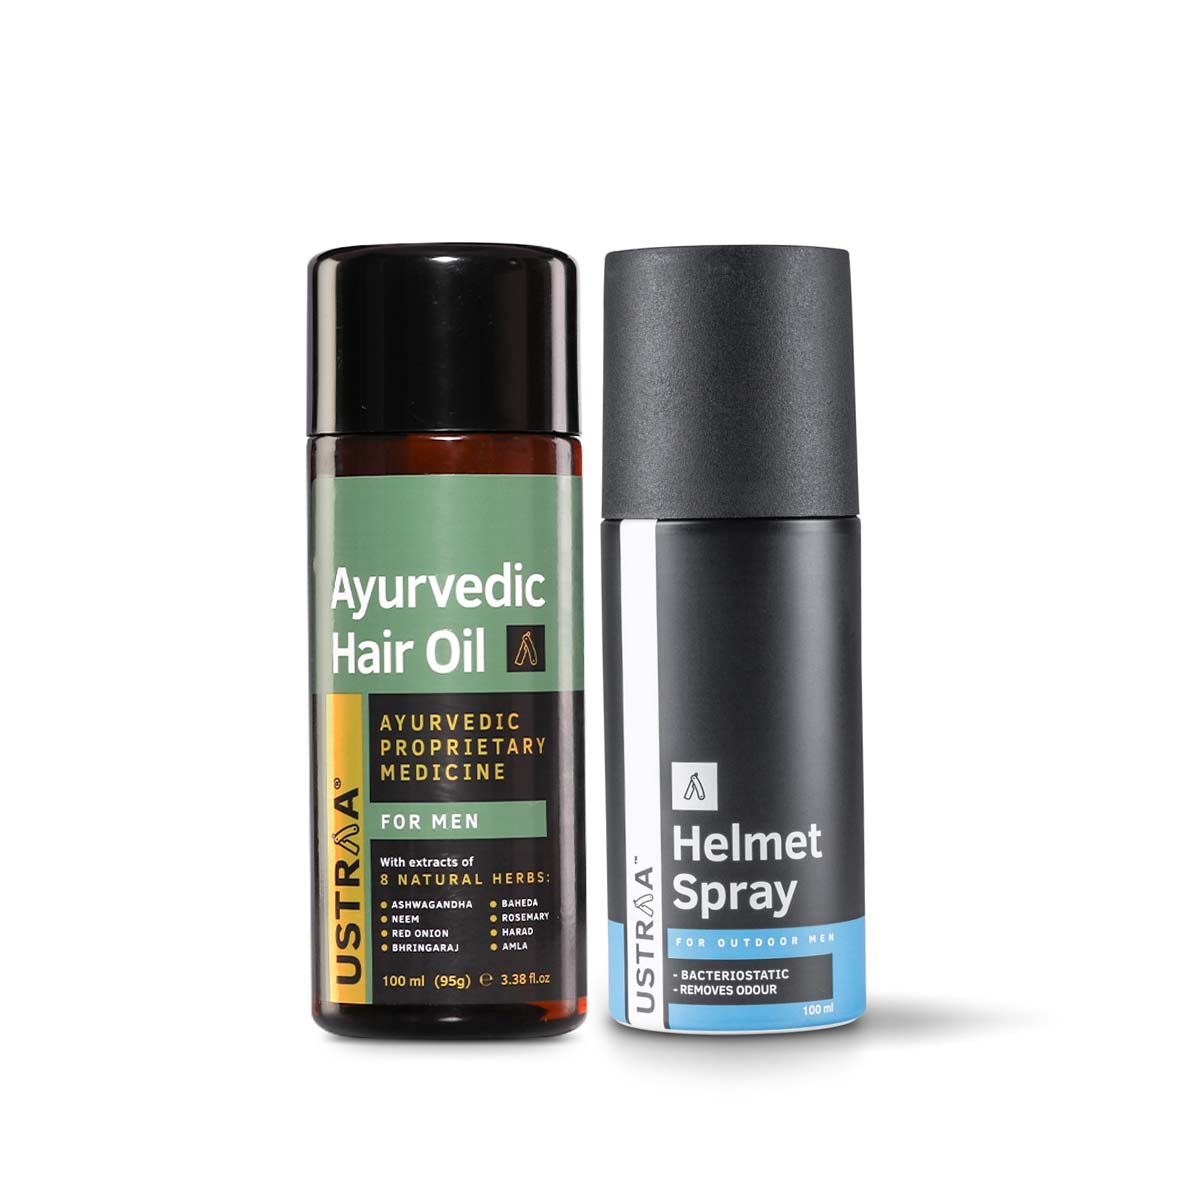 Ayurvedic Hair Oil & Helmet Spray